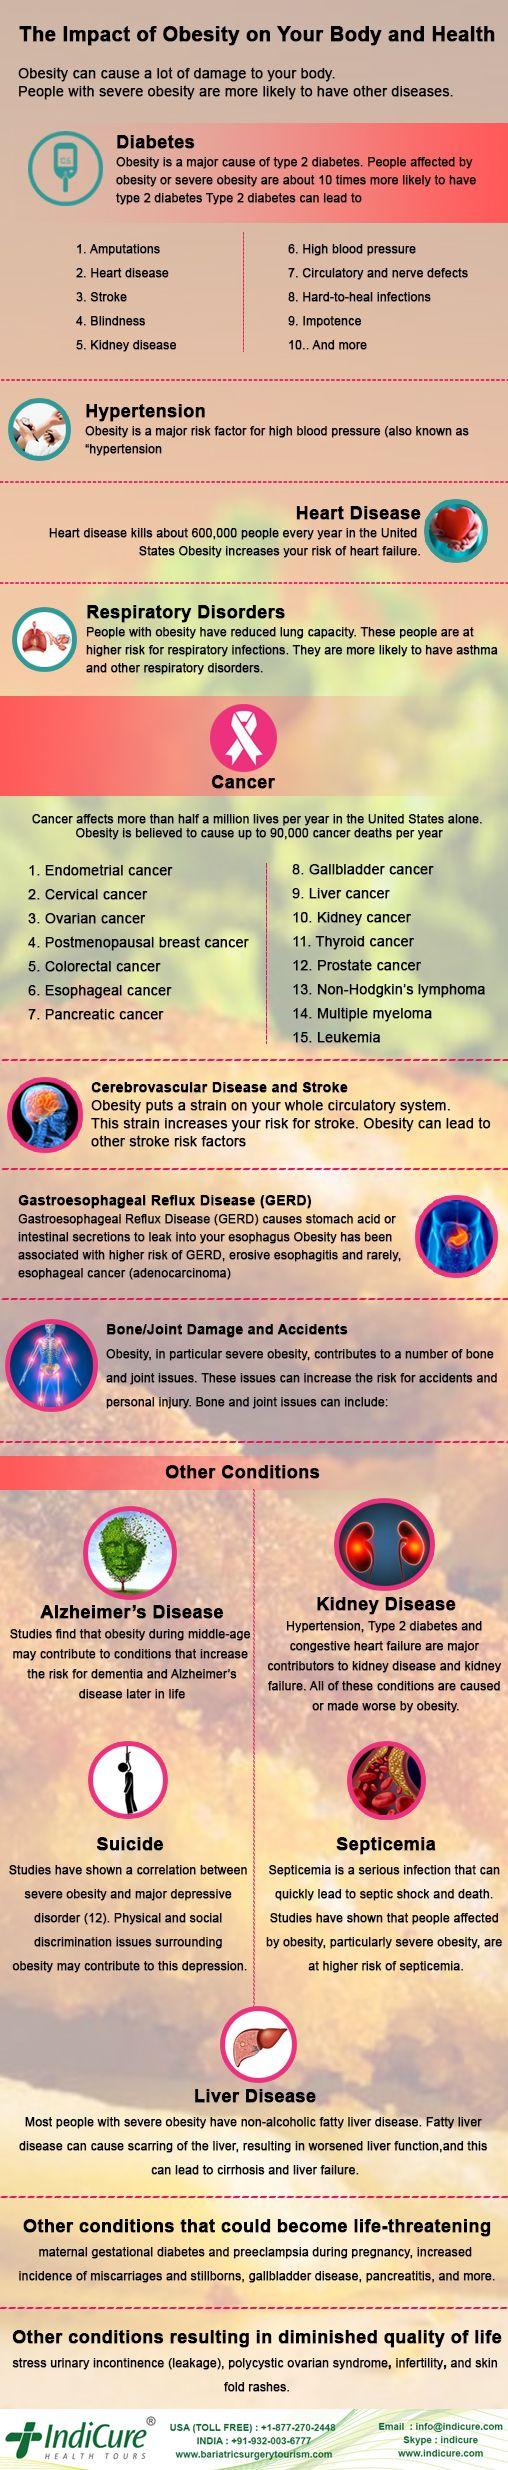 Dr oz vitamin c and weight loss image 25